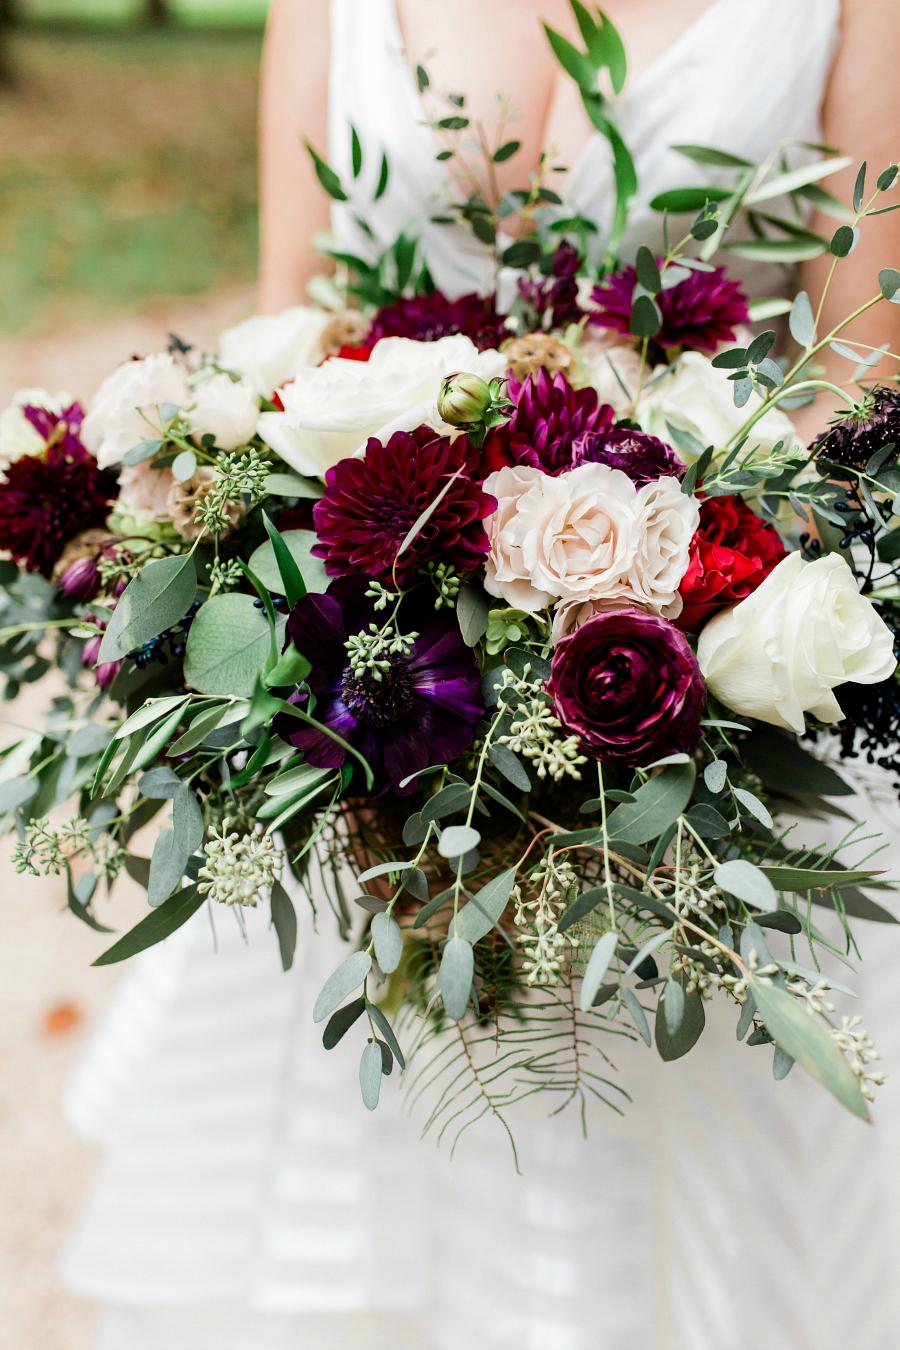 Romantic Bridal Bouquet by Studio Posy